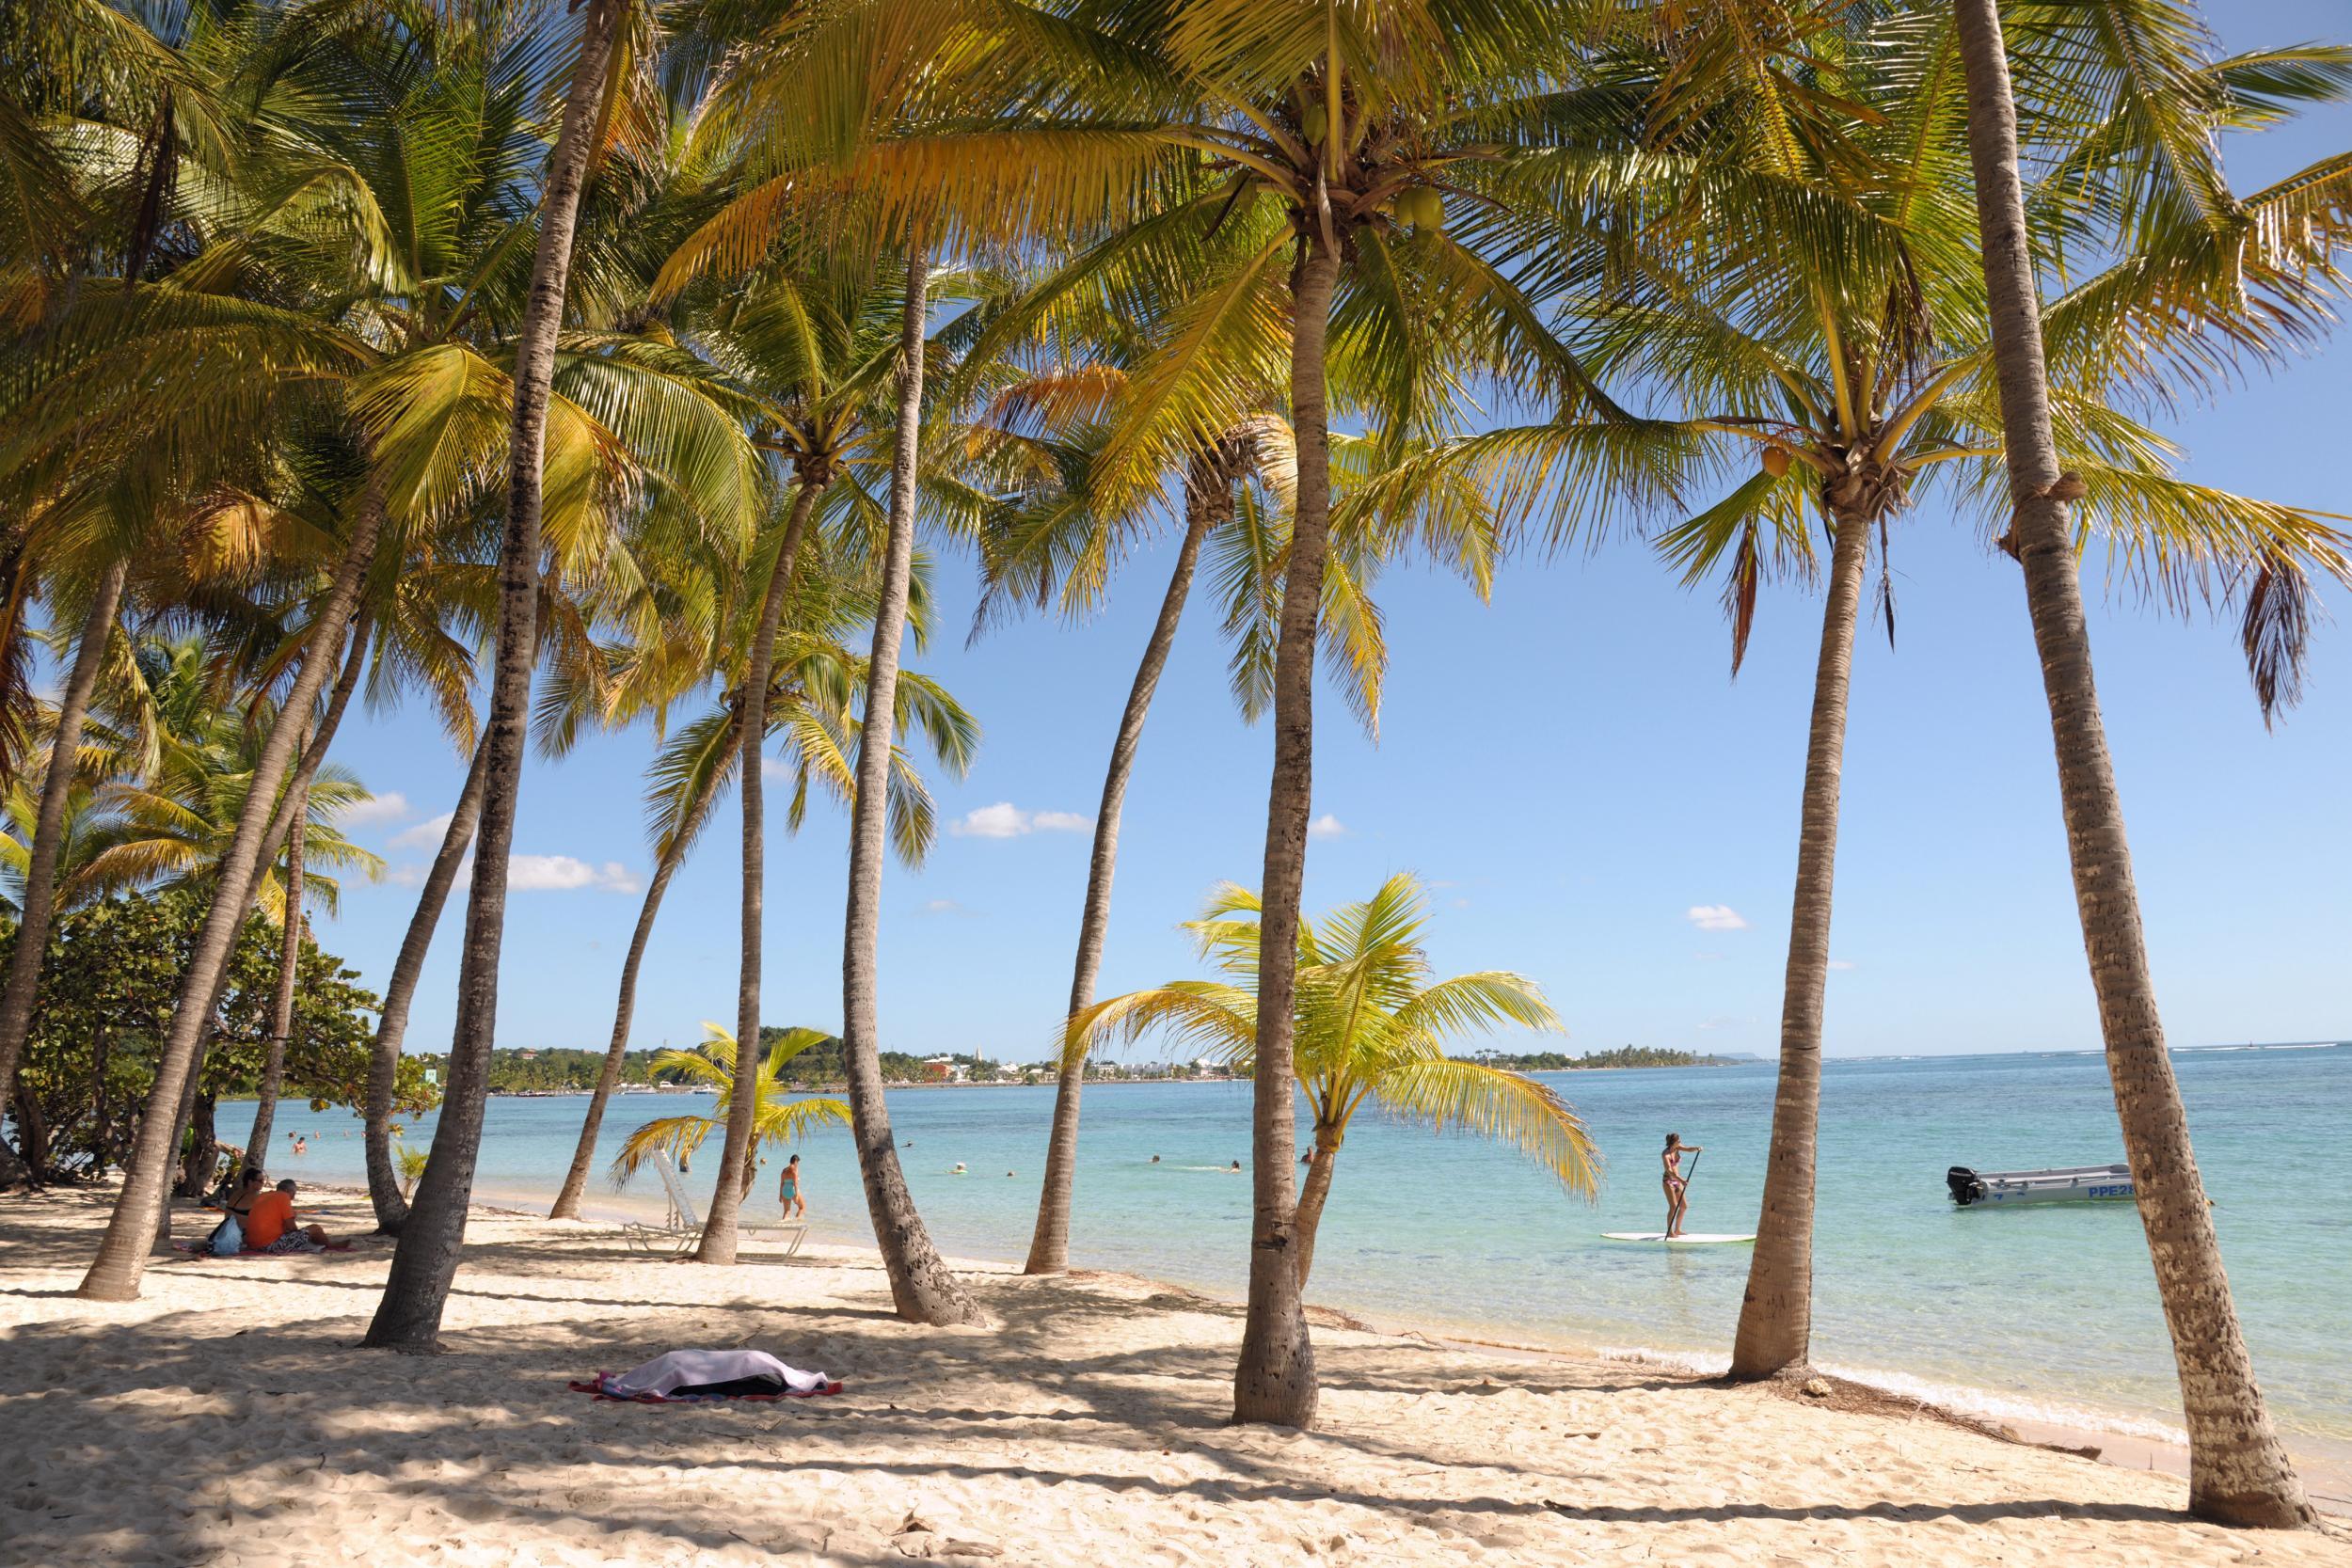 Caribbean holidays: cheap escapes that won't break the bank